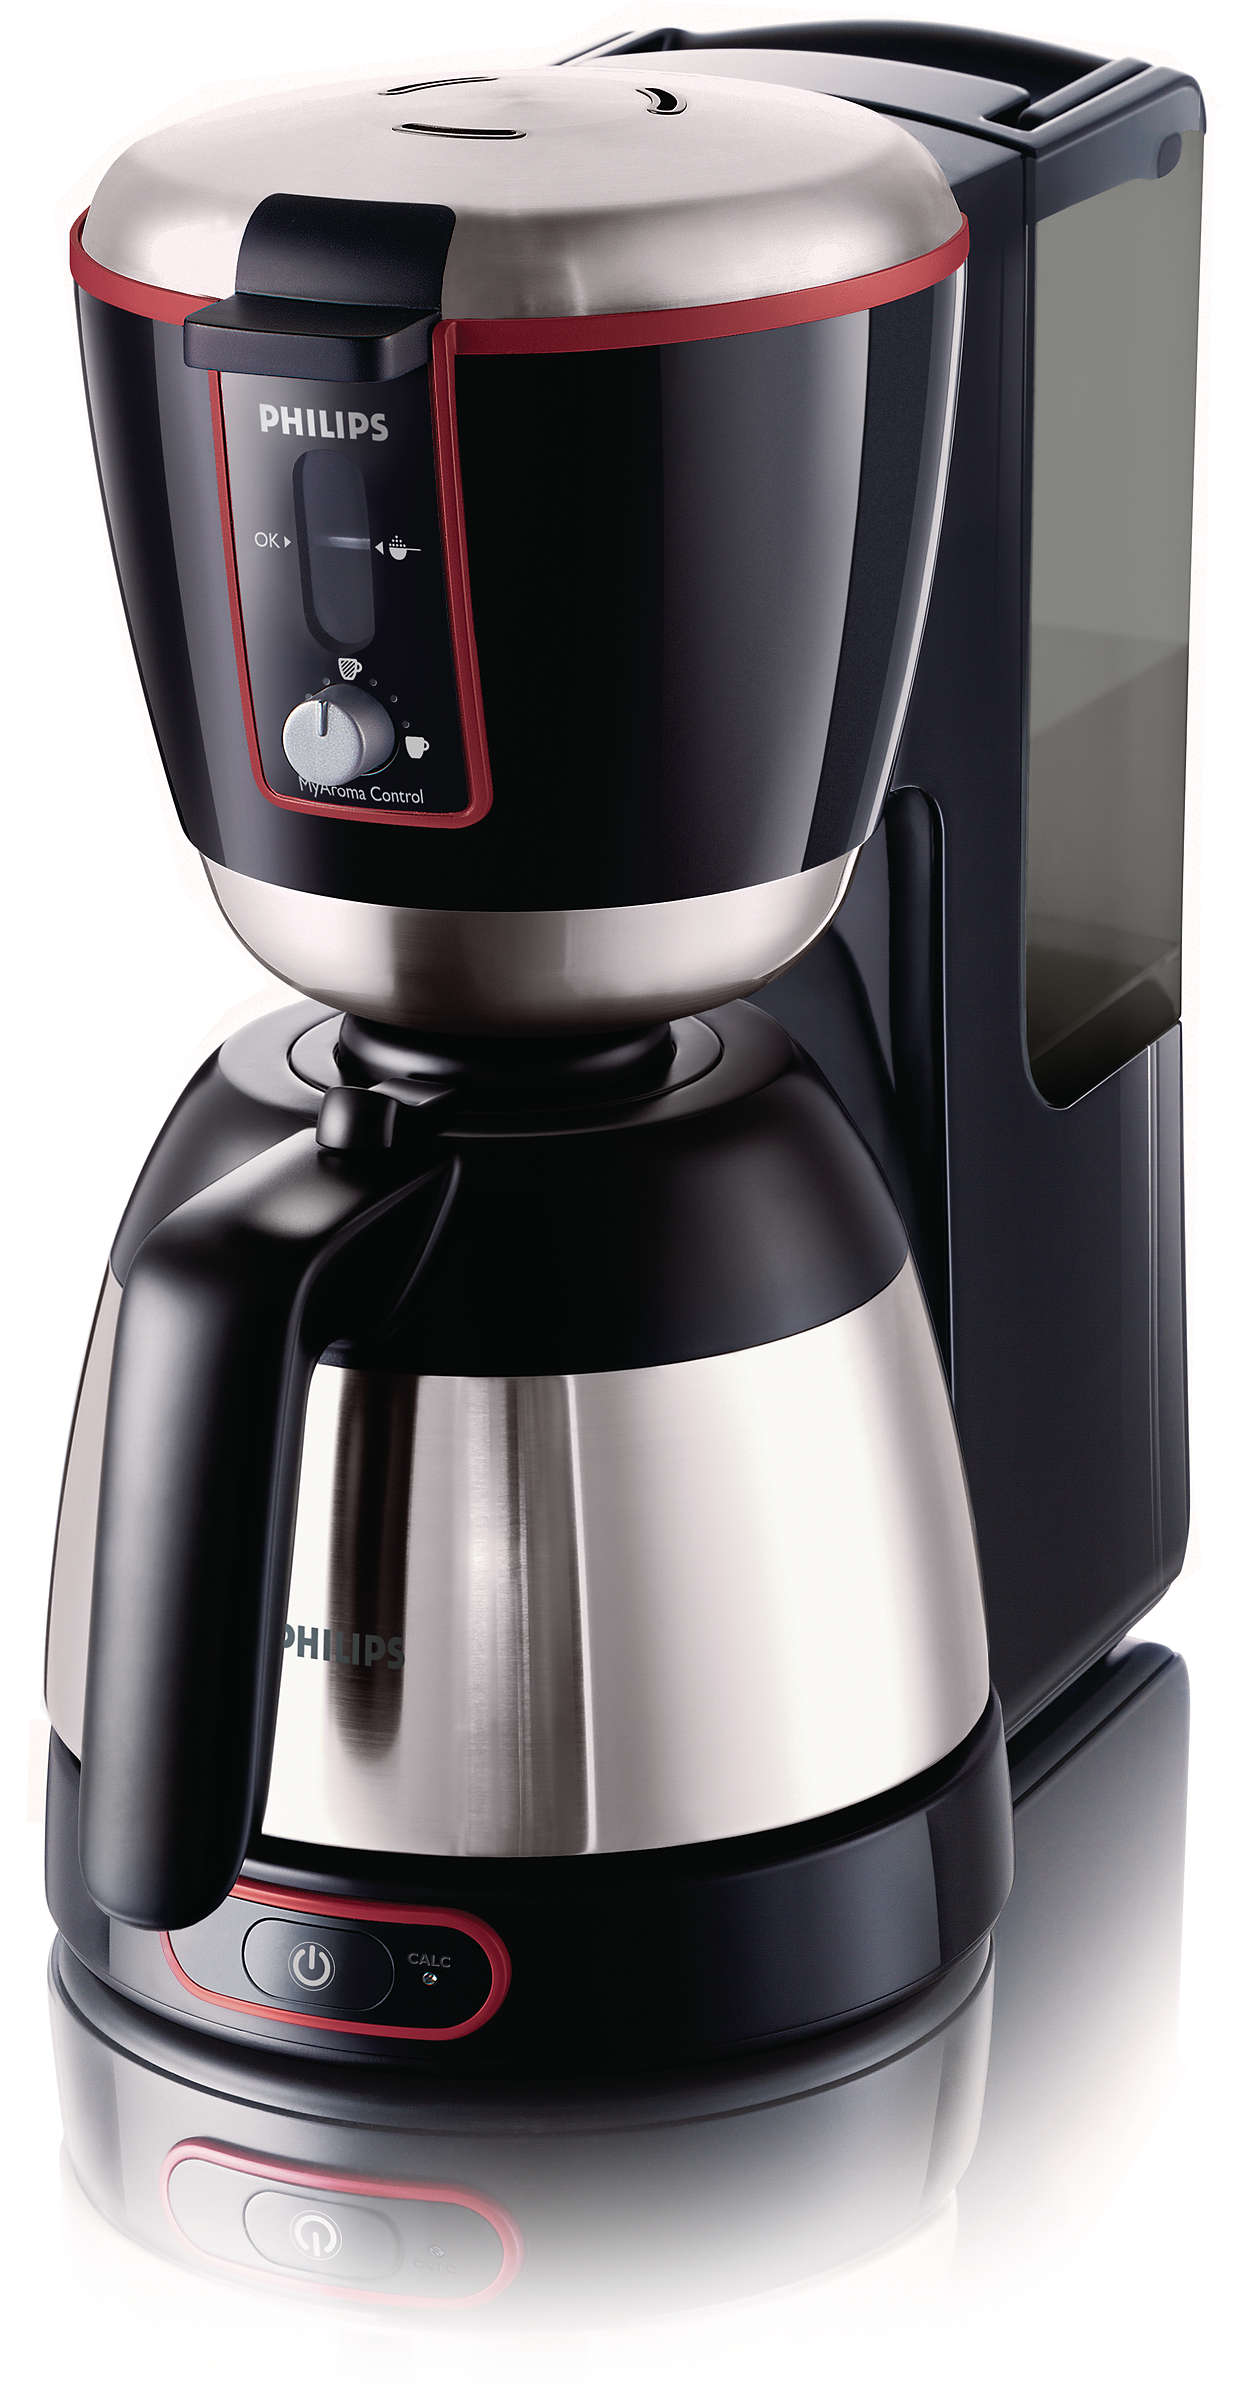 pure essentials kaffeemaschine hd7692 90 philips. Black Bedroom Furniture Sets. Home Design Ideas